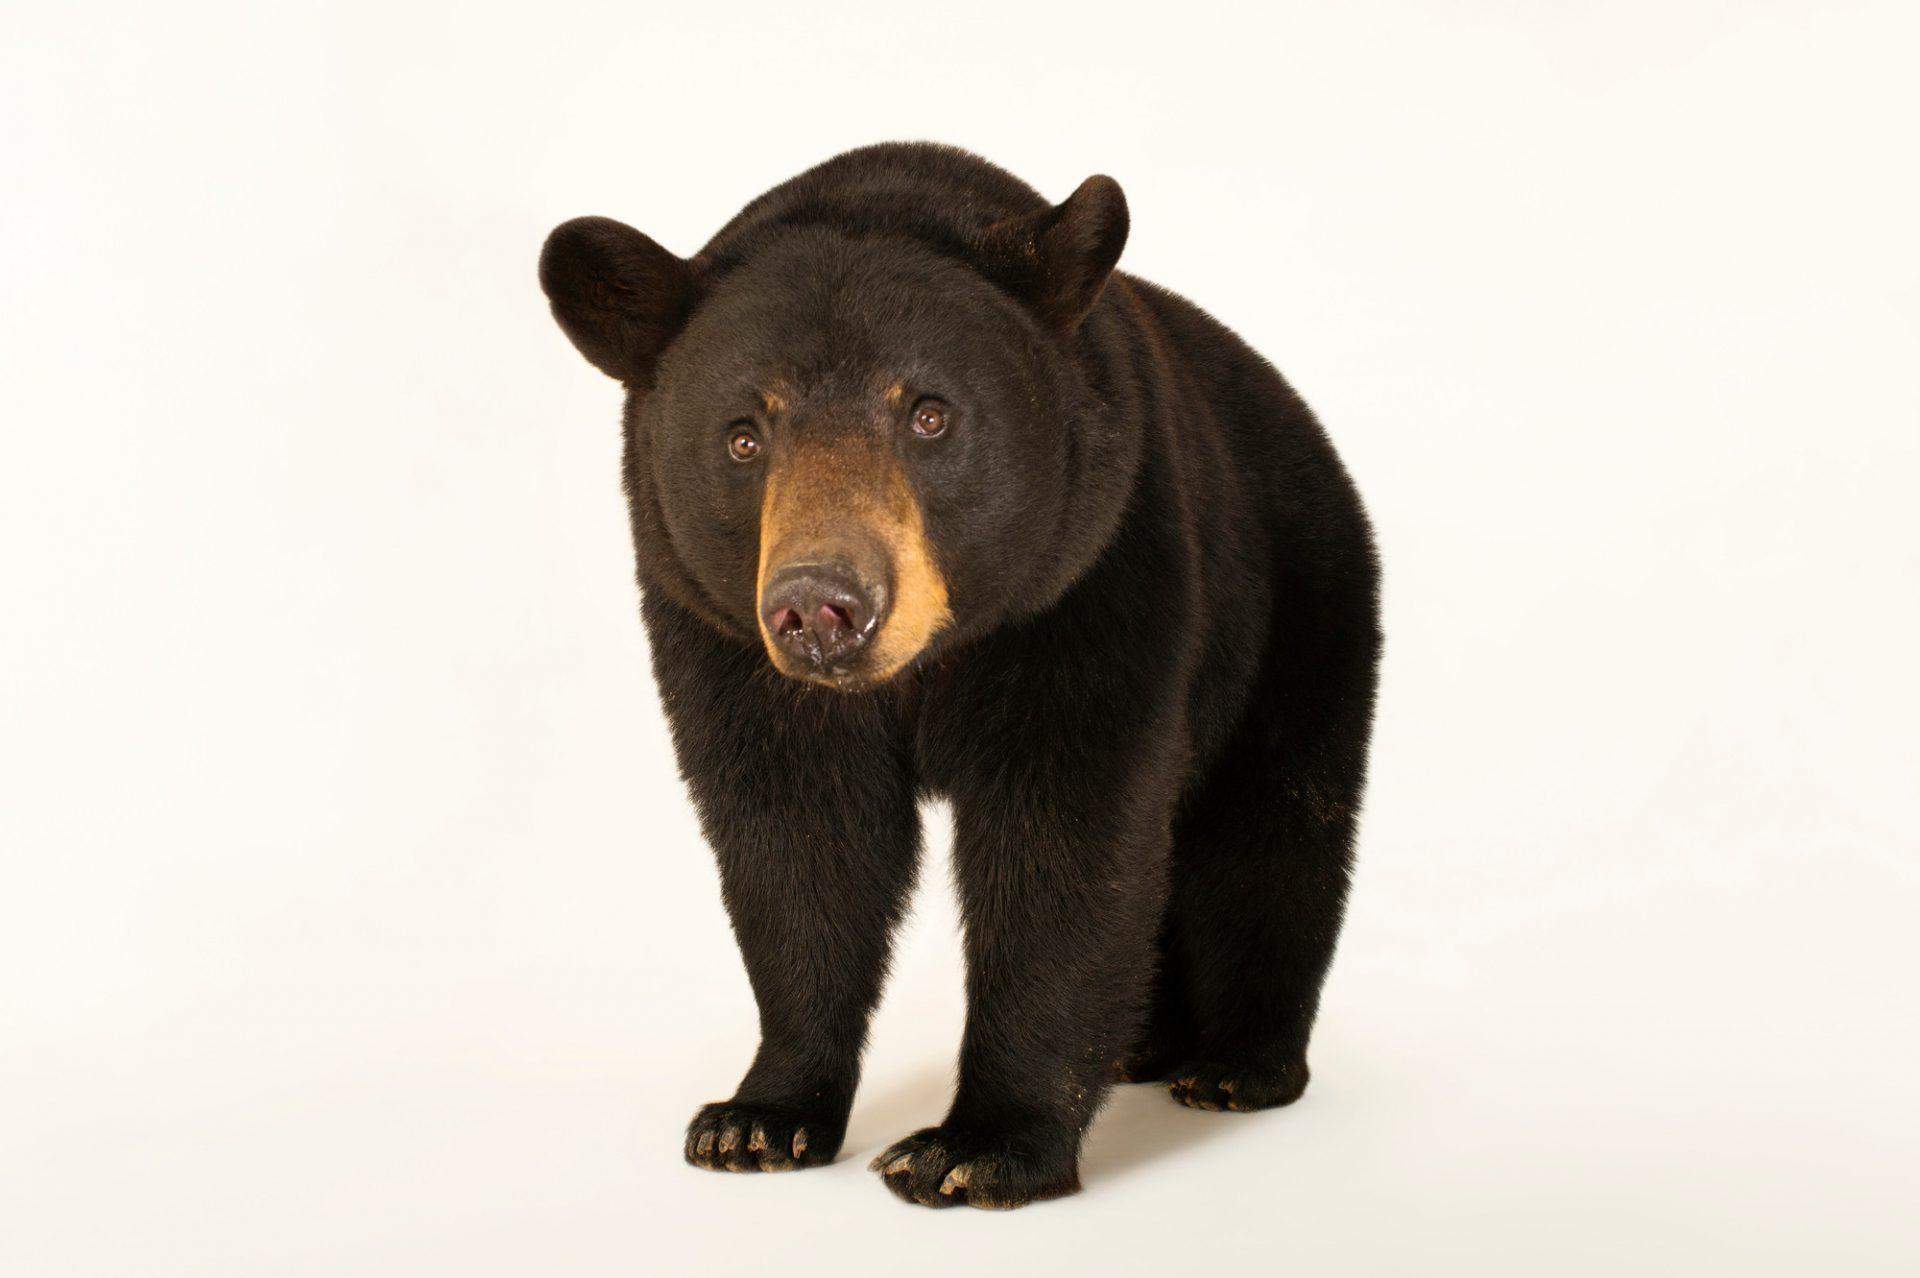 A federally threatened Louisiana black bear (Ursus americanus luteolus) at the Caldwell Zoo in Tyler, Texas.